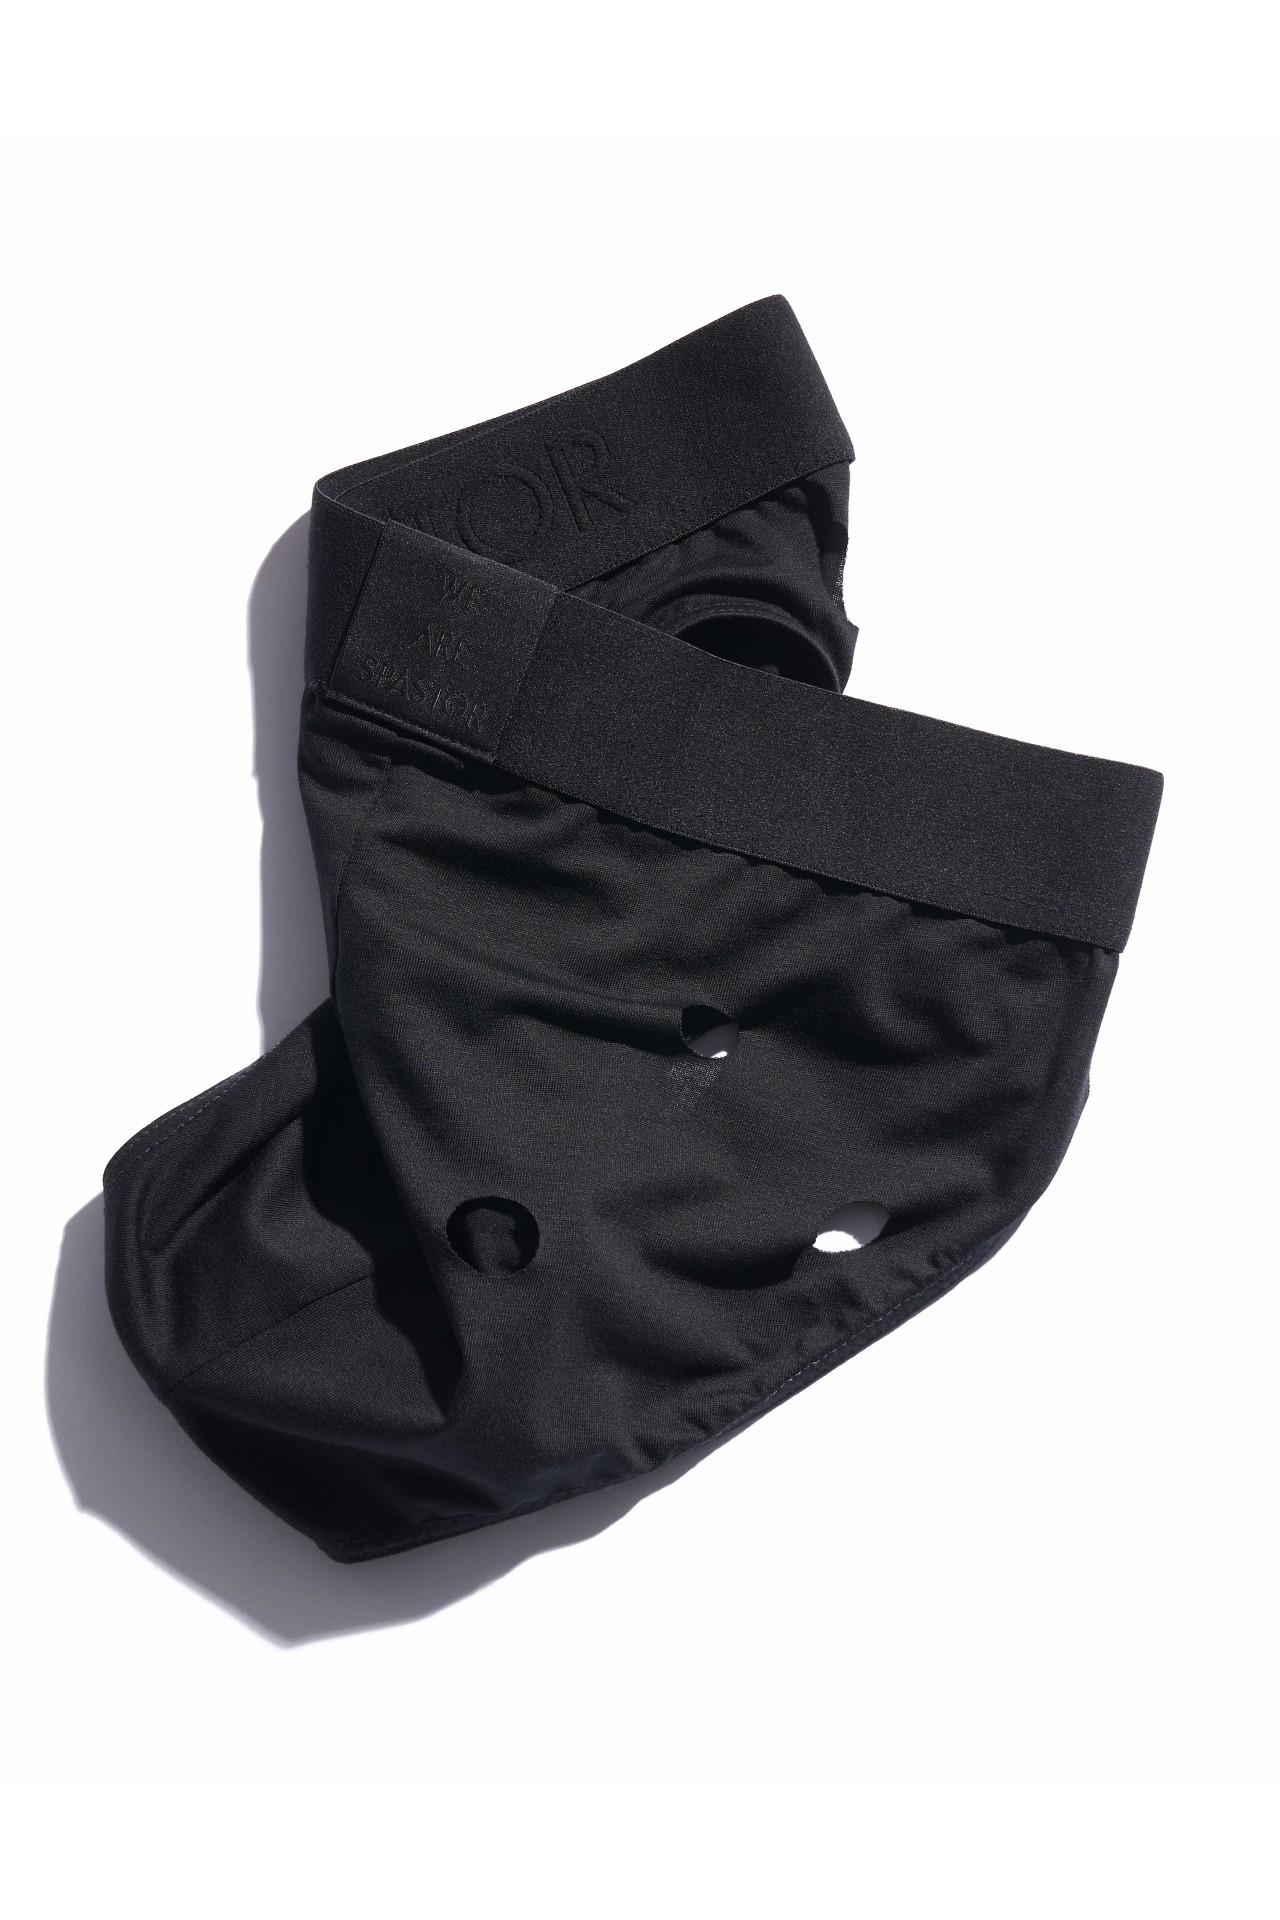 SHIA V1 BLACK - 1 PACK